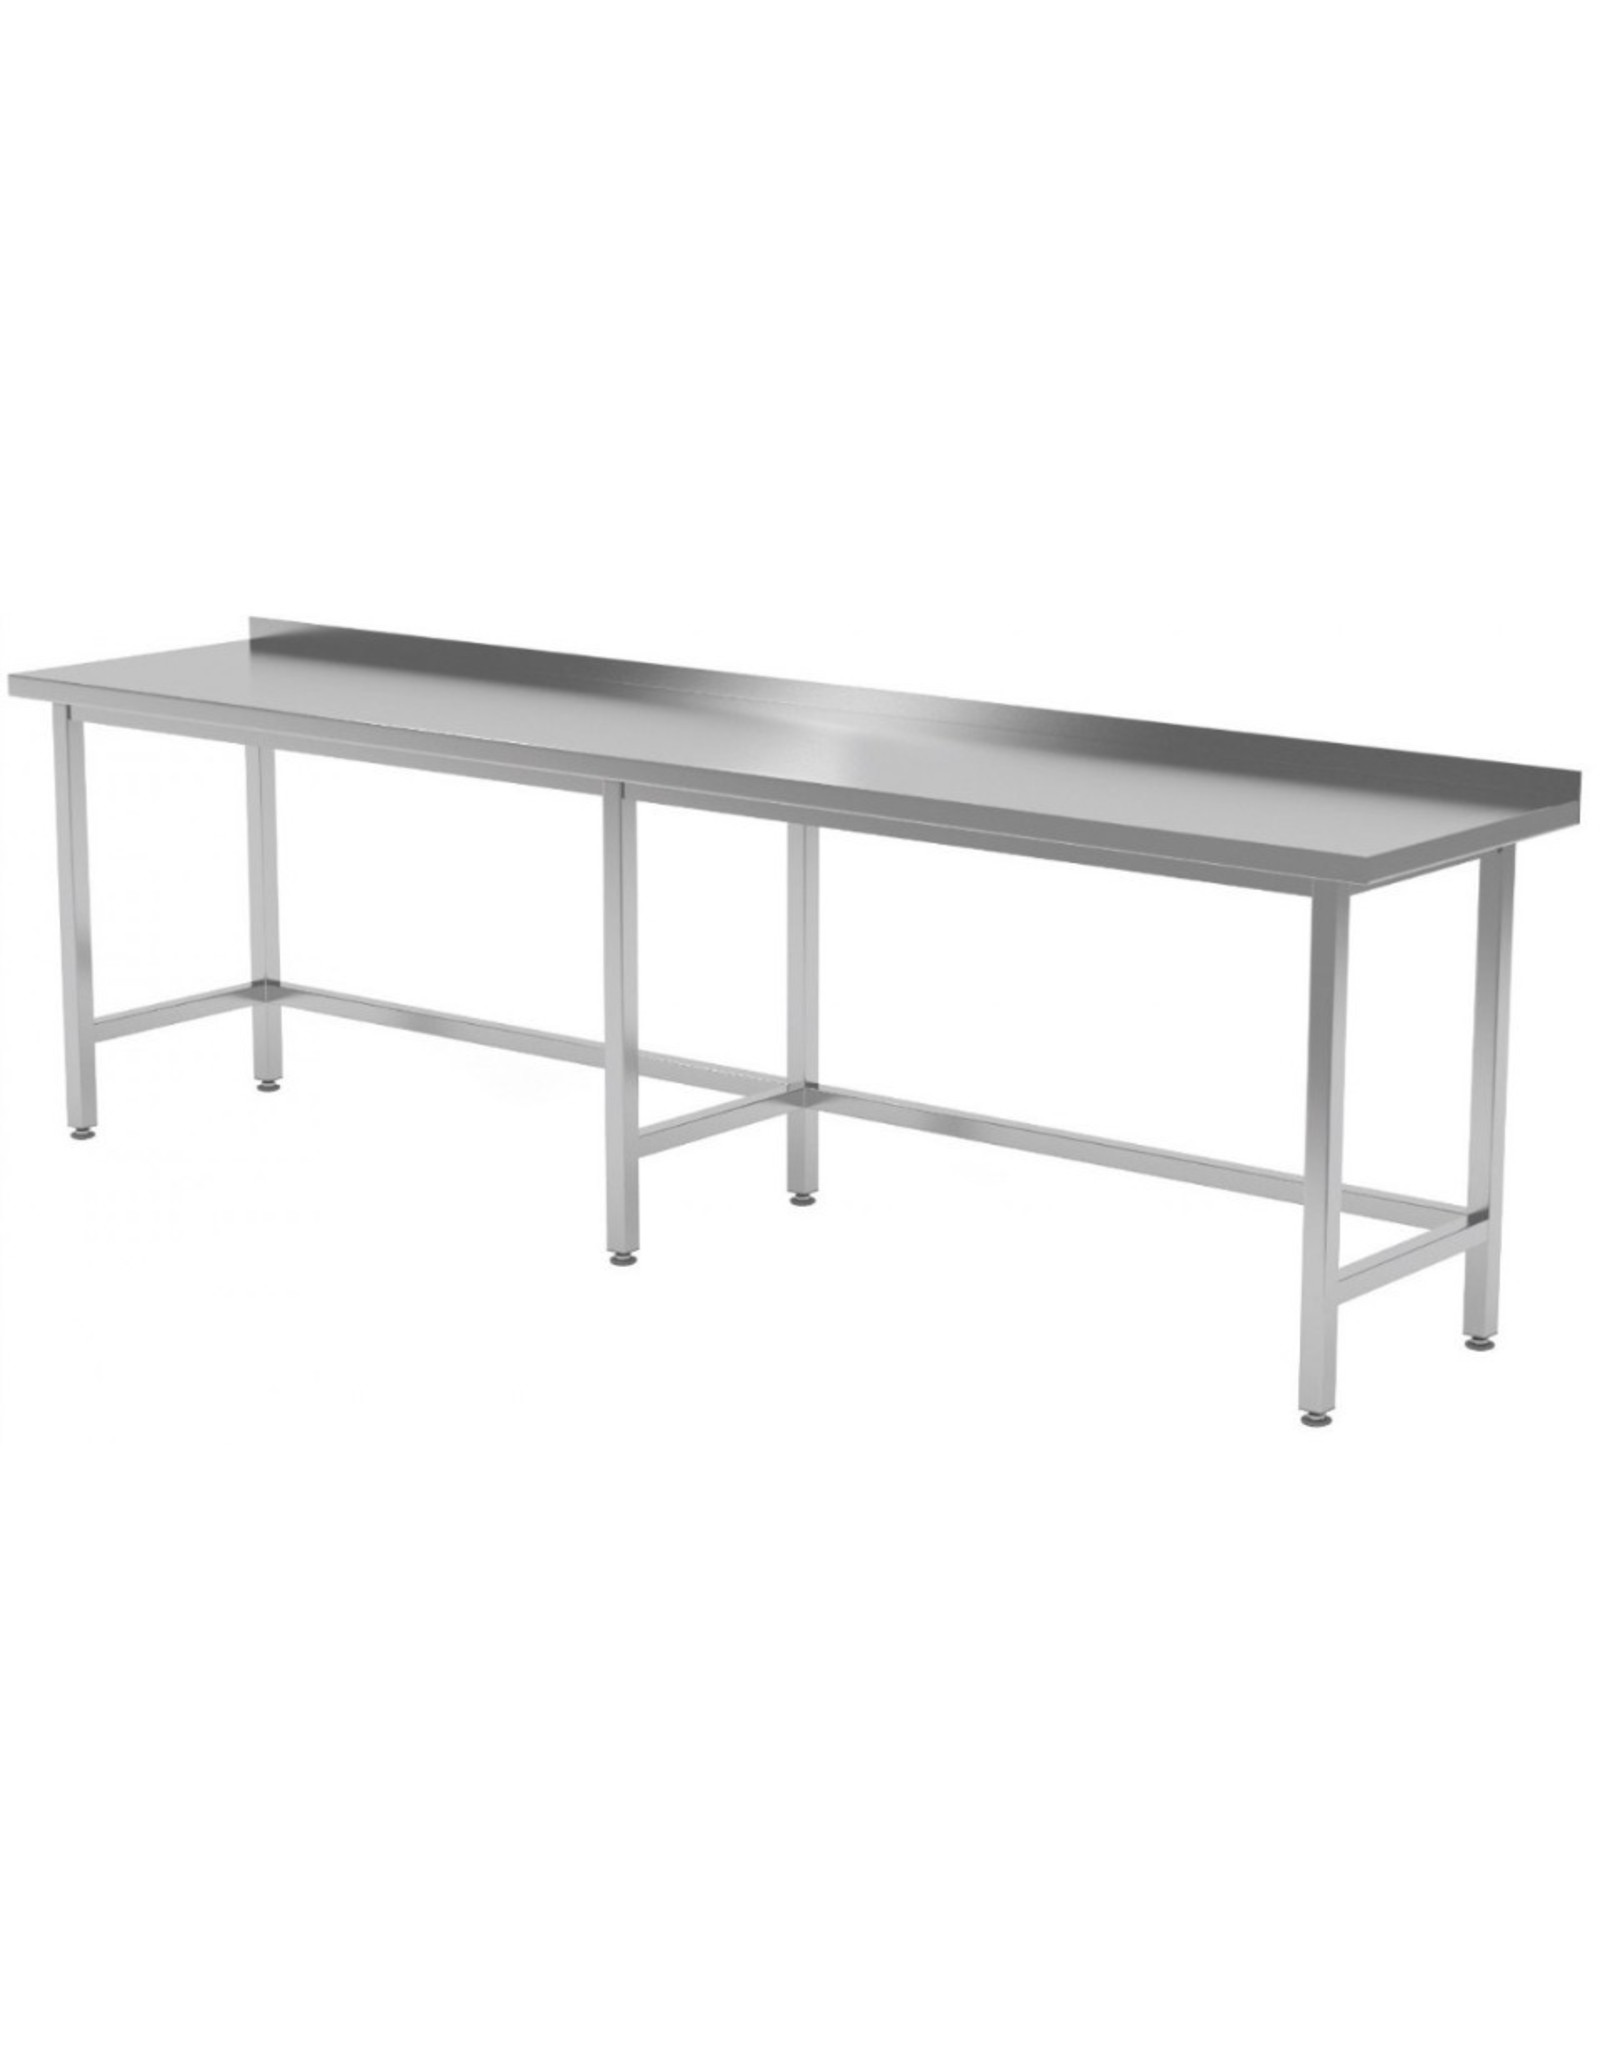 Werktafel met open onderkant verstevigd | 2000-2800mm breed | 600 of 700mm diep